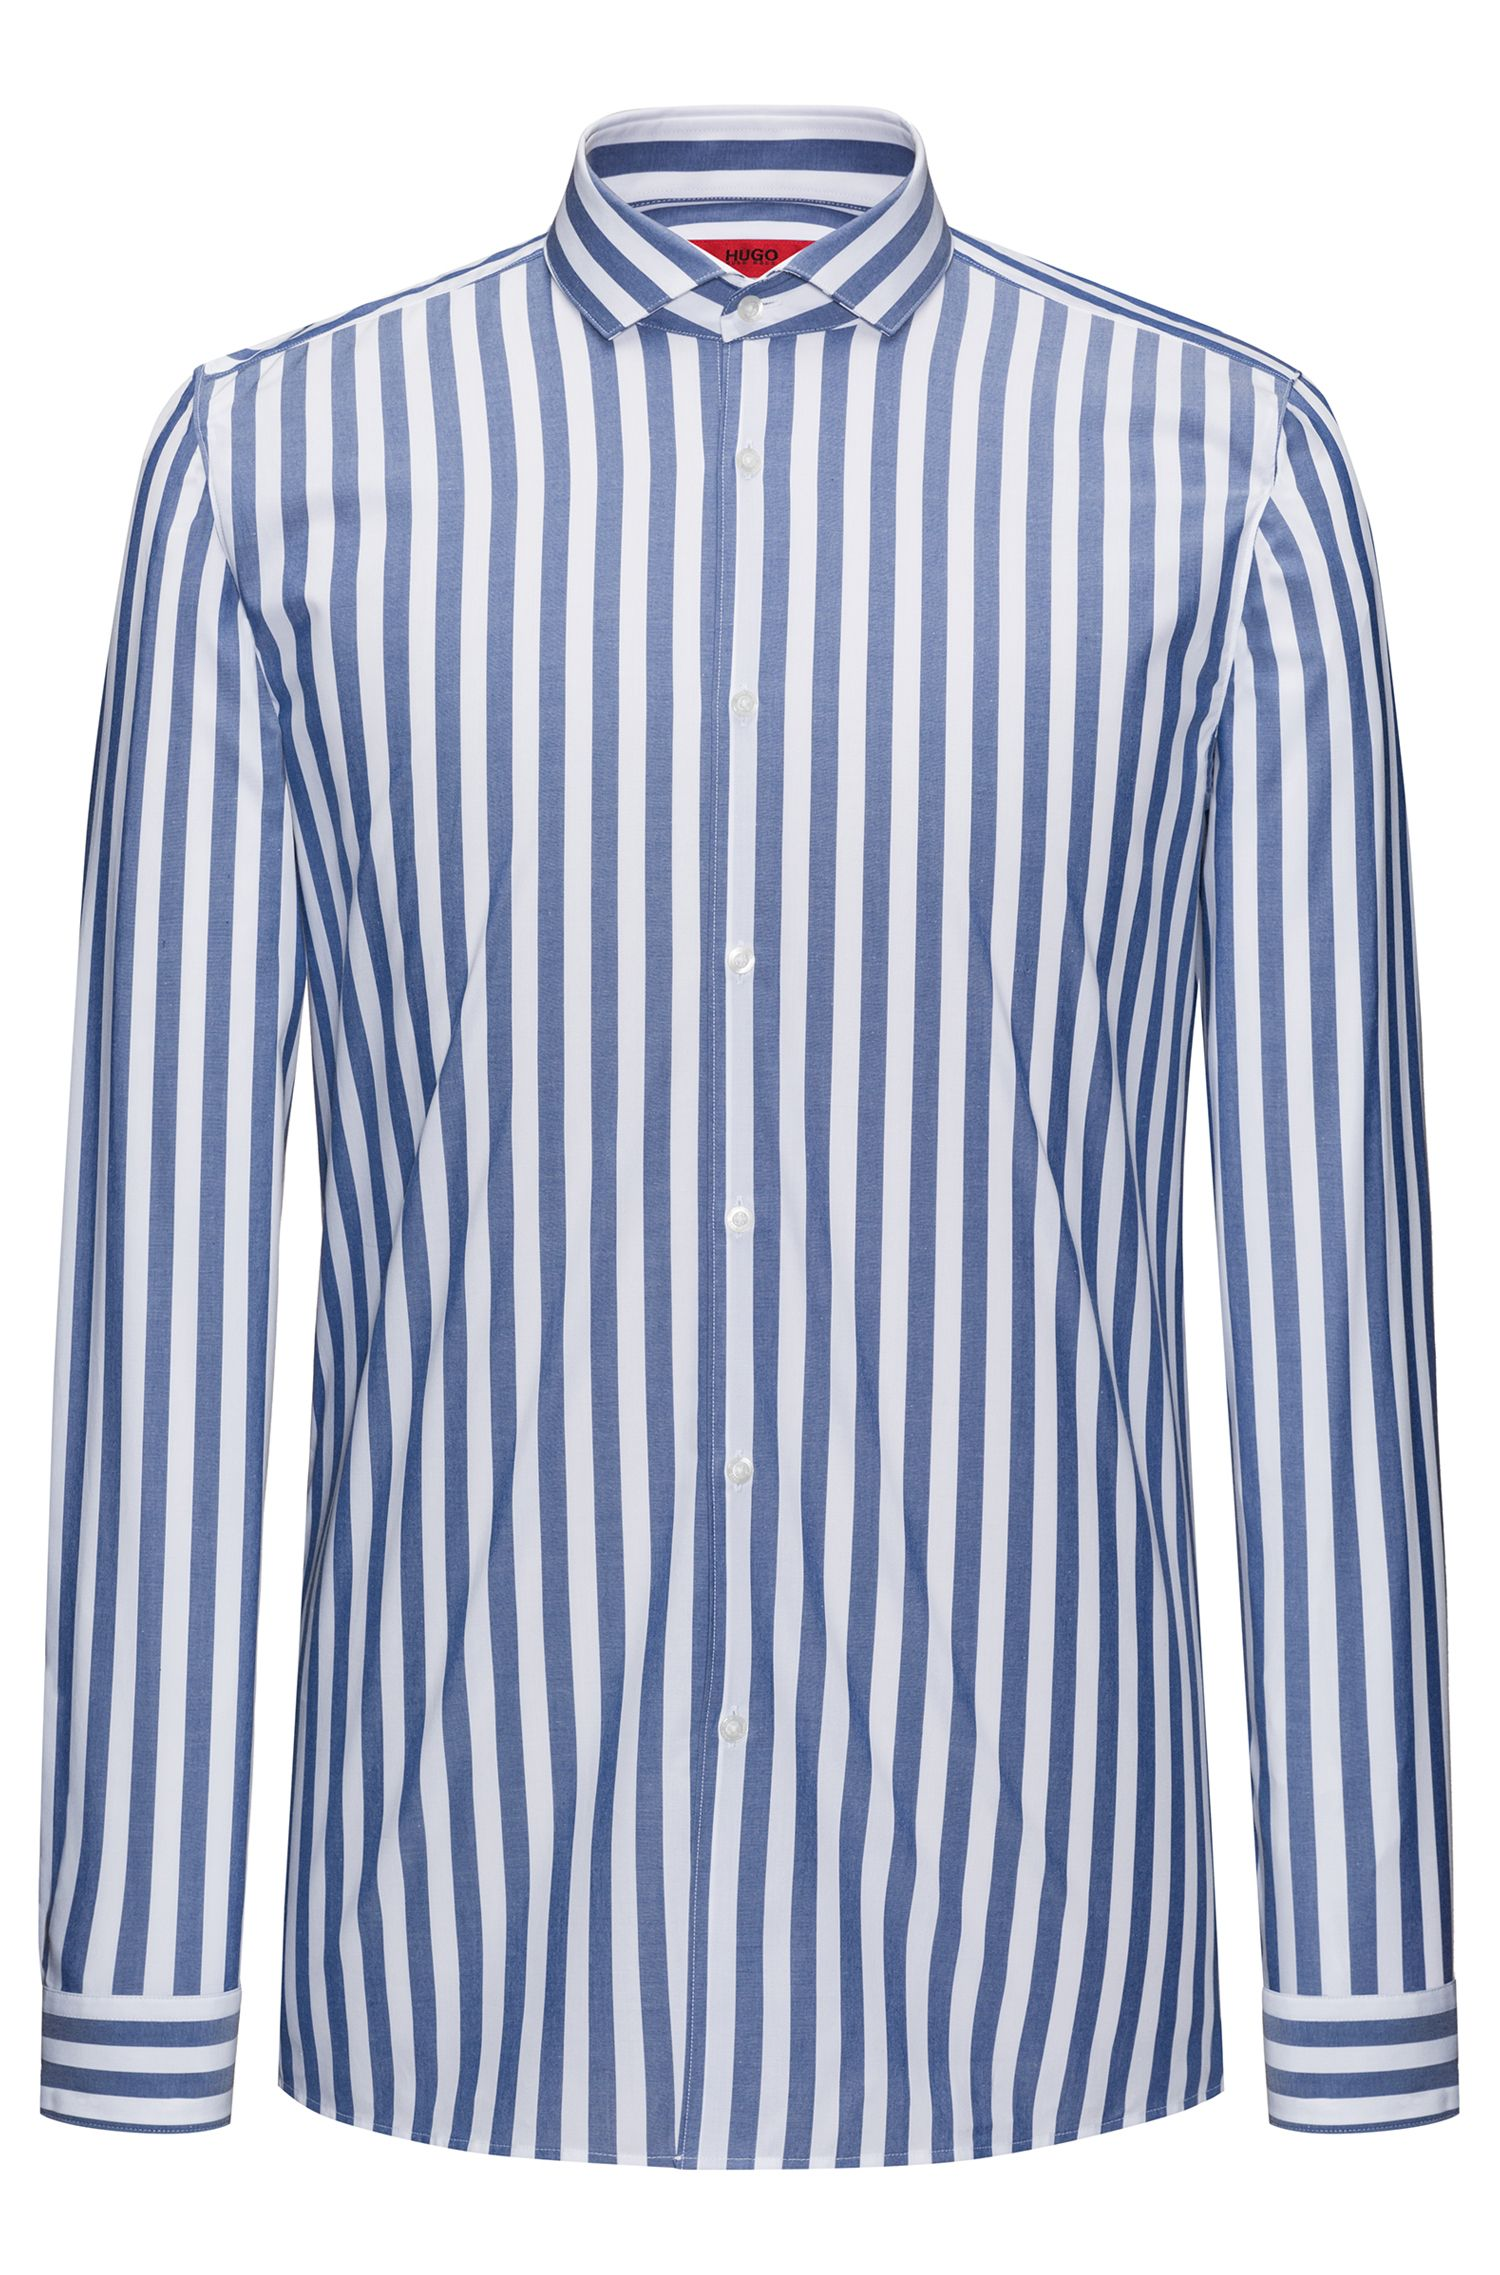 Awning Striped Poplin Sport Shirt, Extra Slim Fit | Erriko, Blue